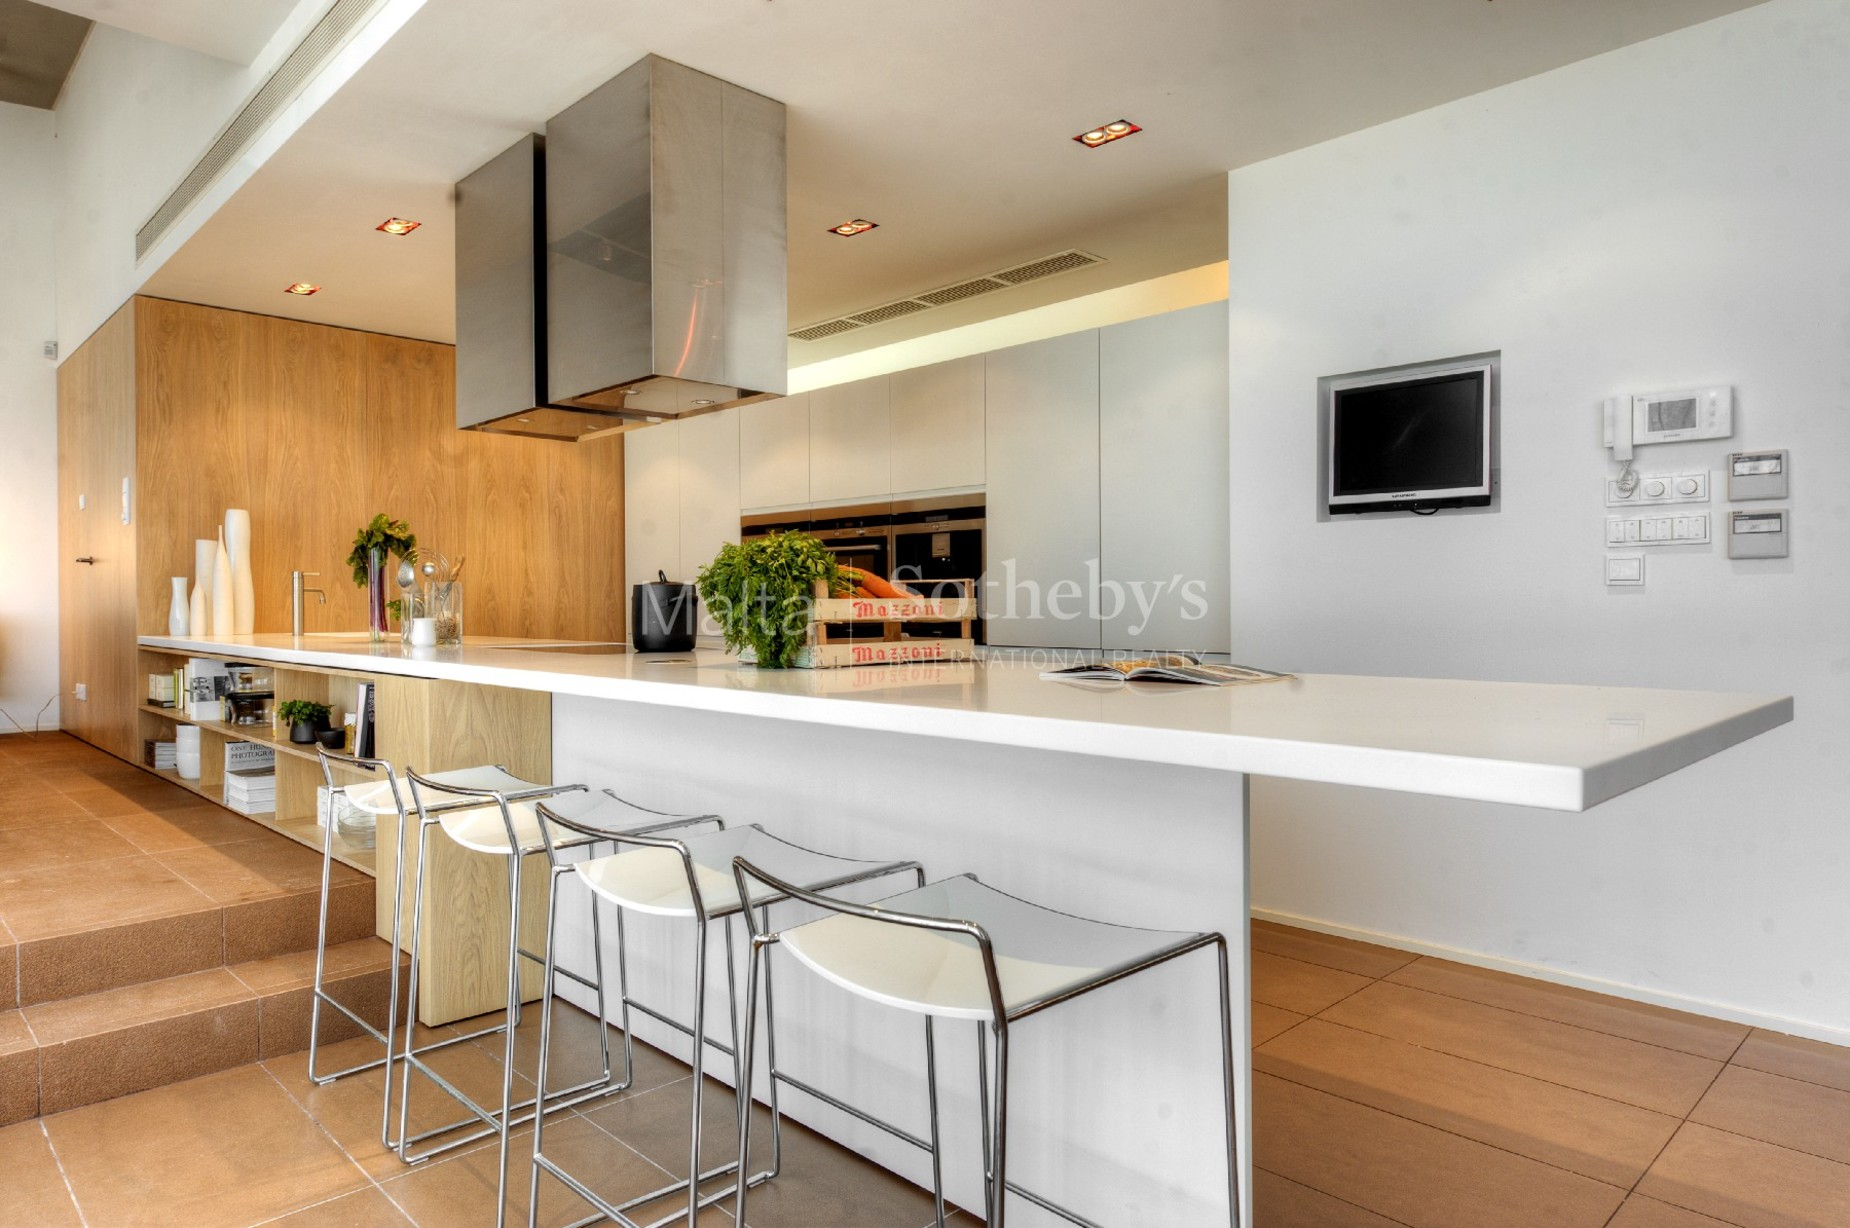 3 bed Villa For Rent in Bahar ic-Caghaq, Bahar ic-Caghaq - thumb 7